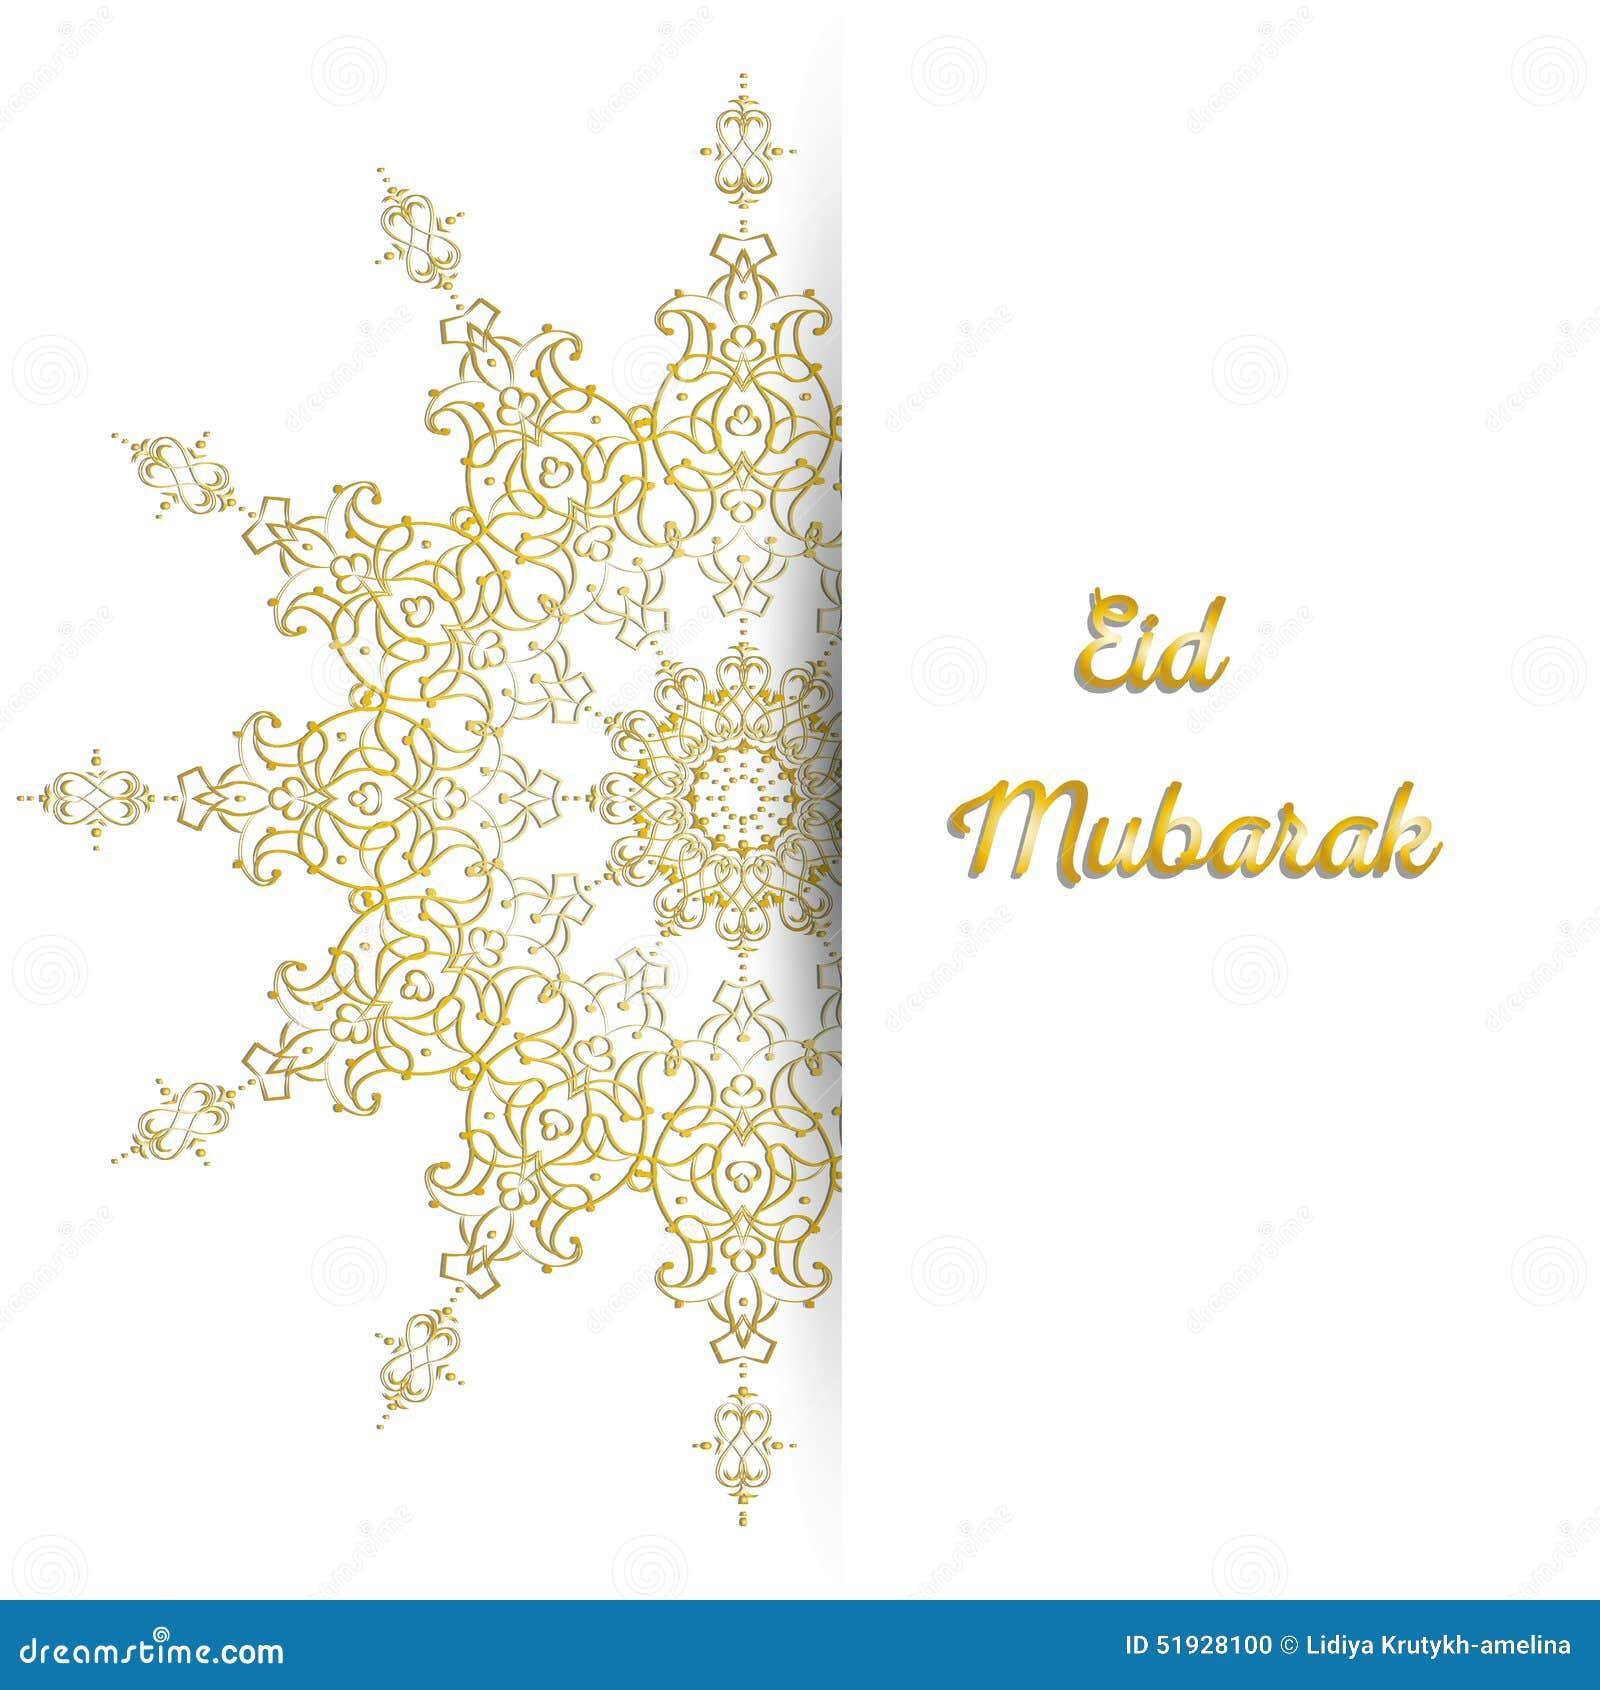 Illustration of eid mubarak greeting card stock vector illustration of eid mubarak greeting card m4hsunfo